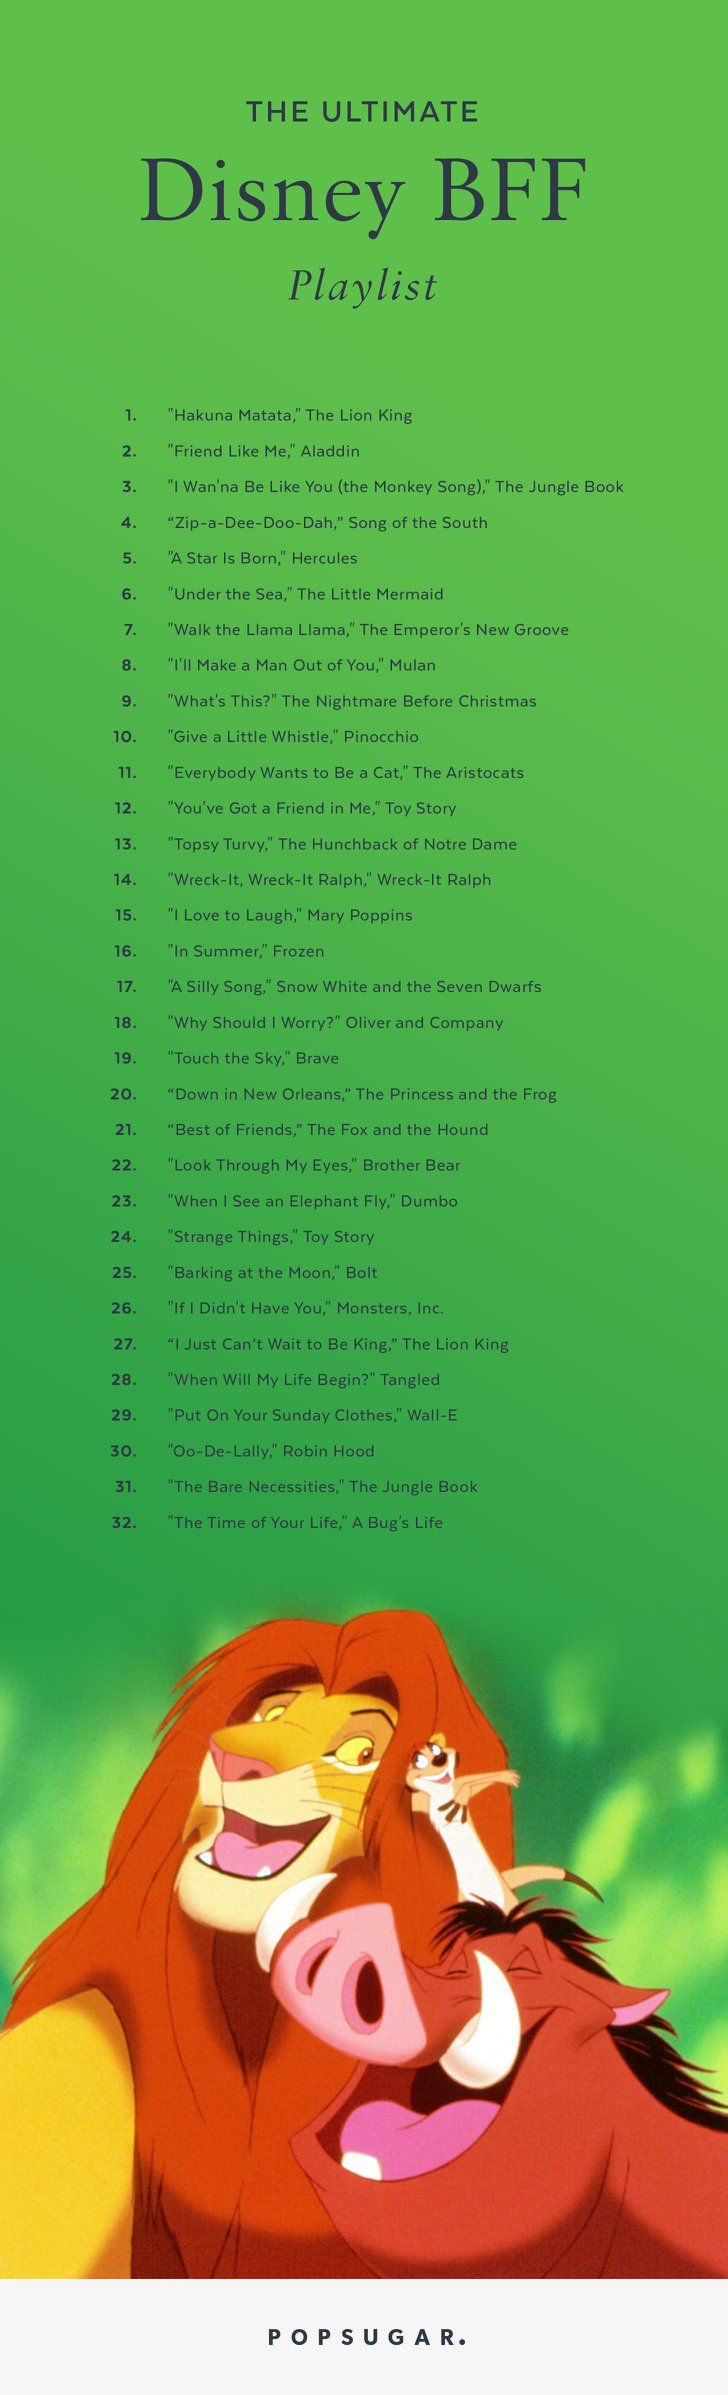 The Ultimate Disney BFF Playlist